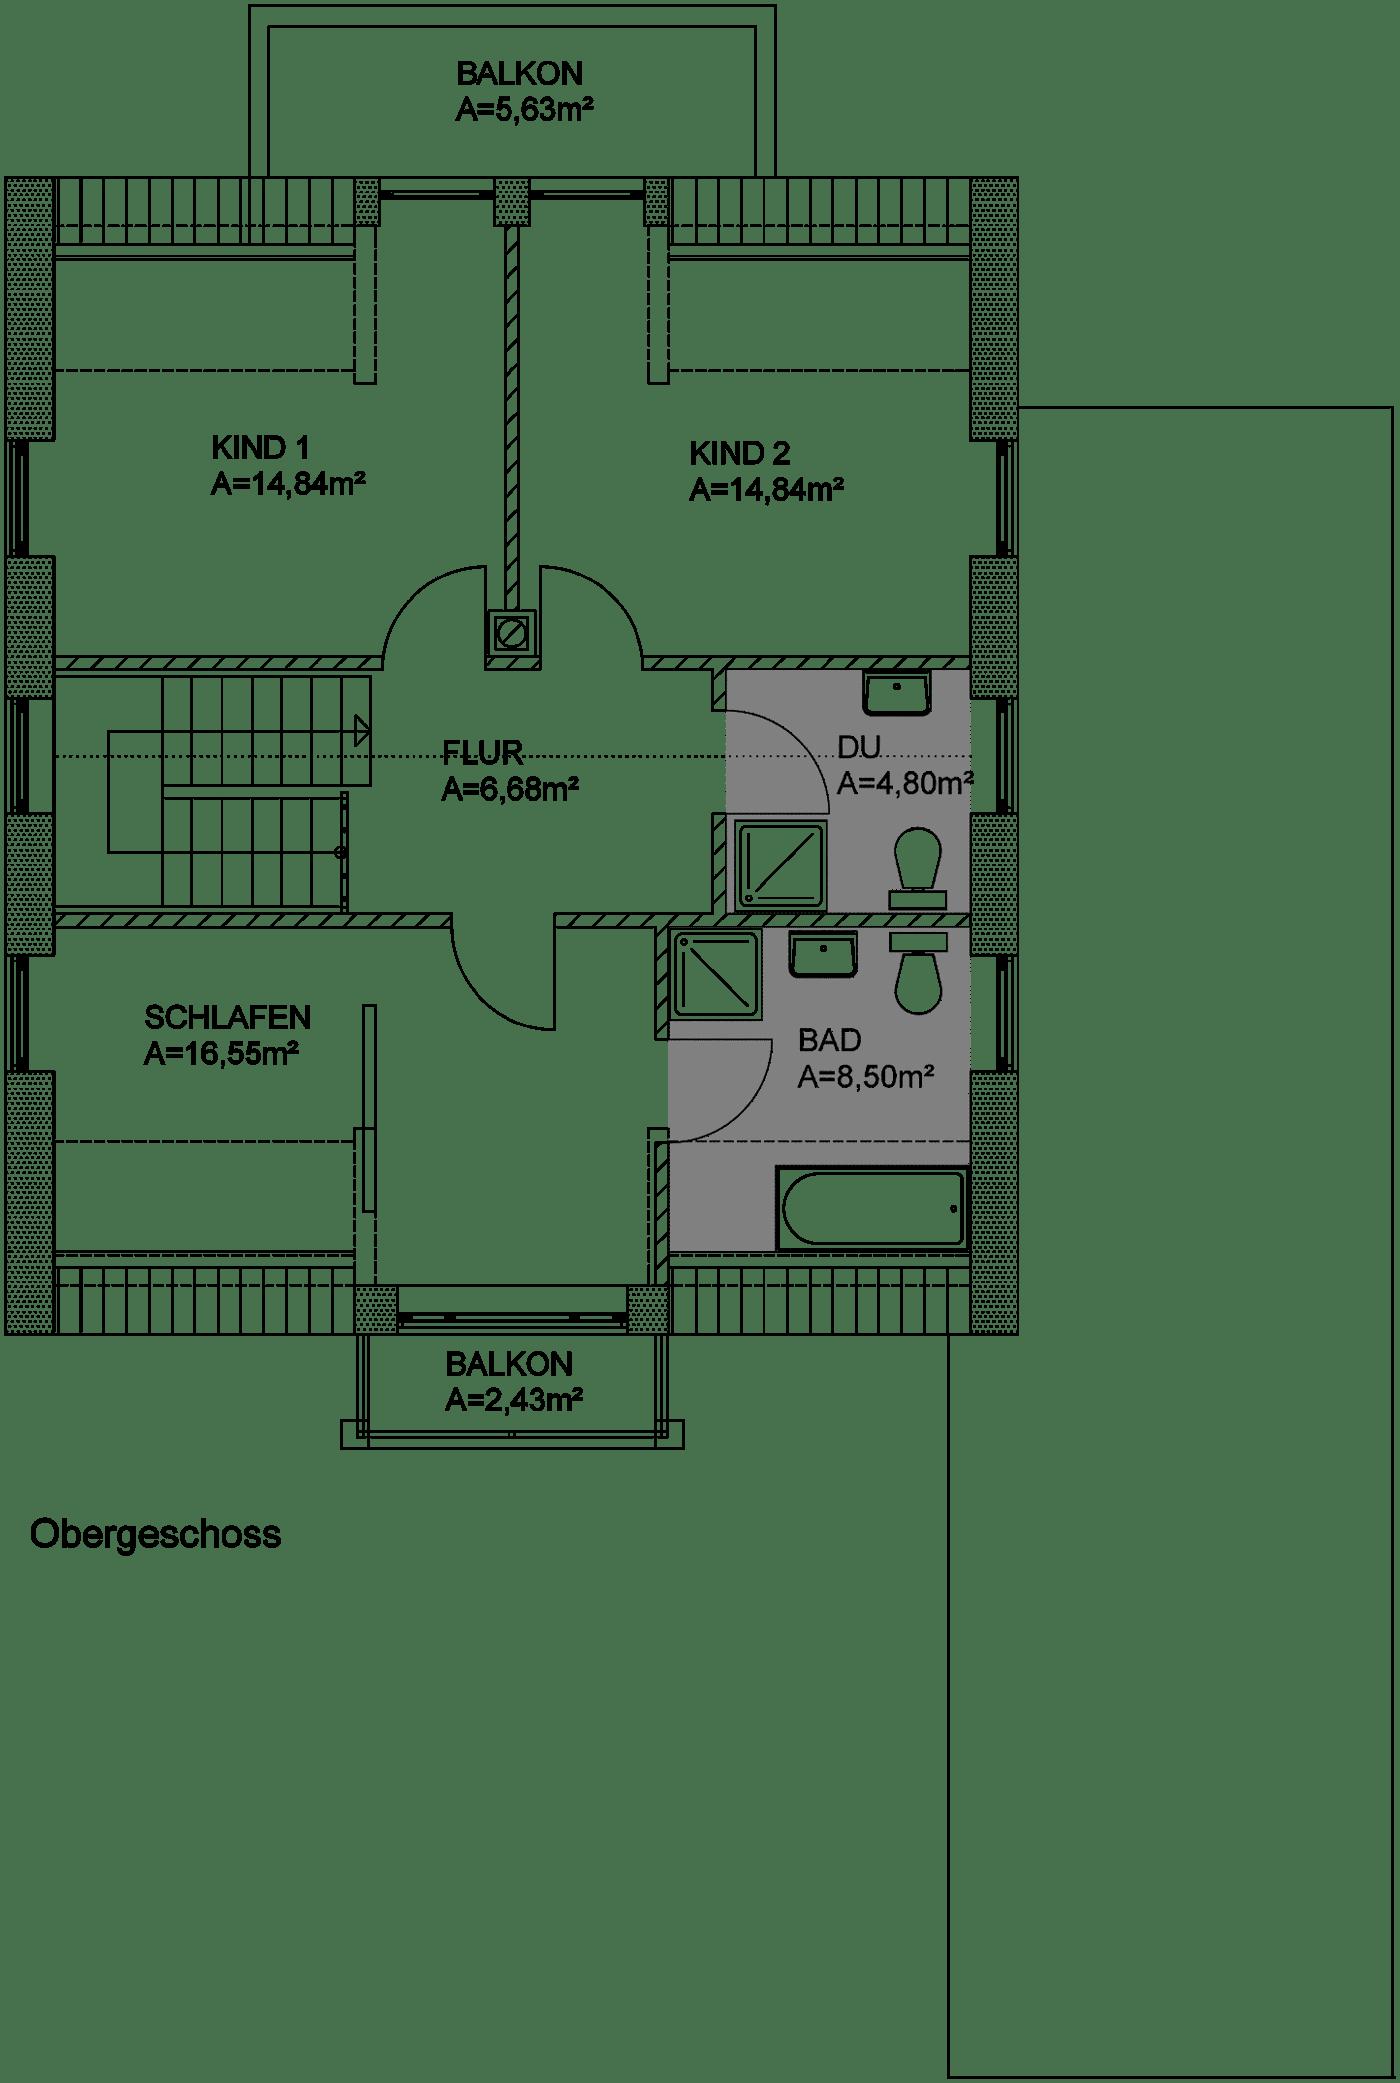 energie-effizienzhaus-plus-grundriss-og